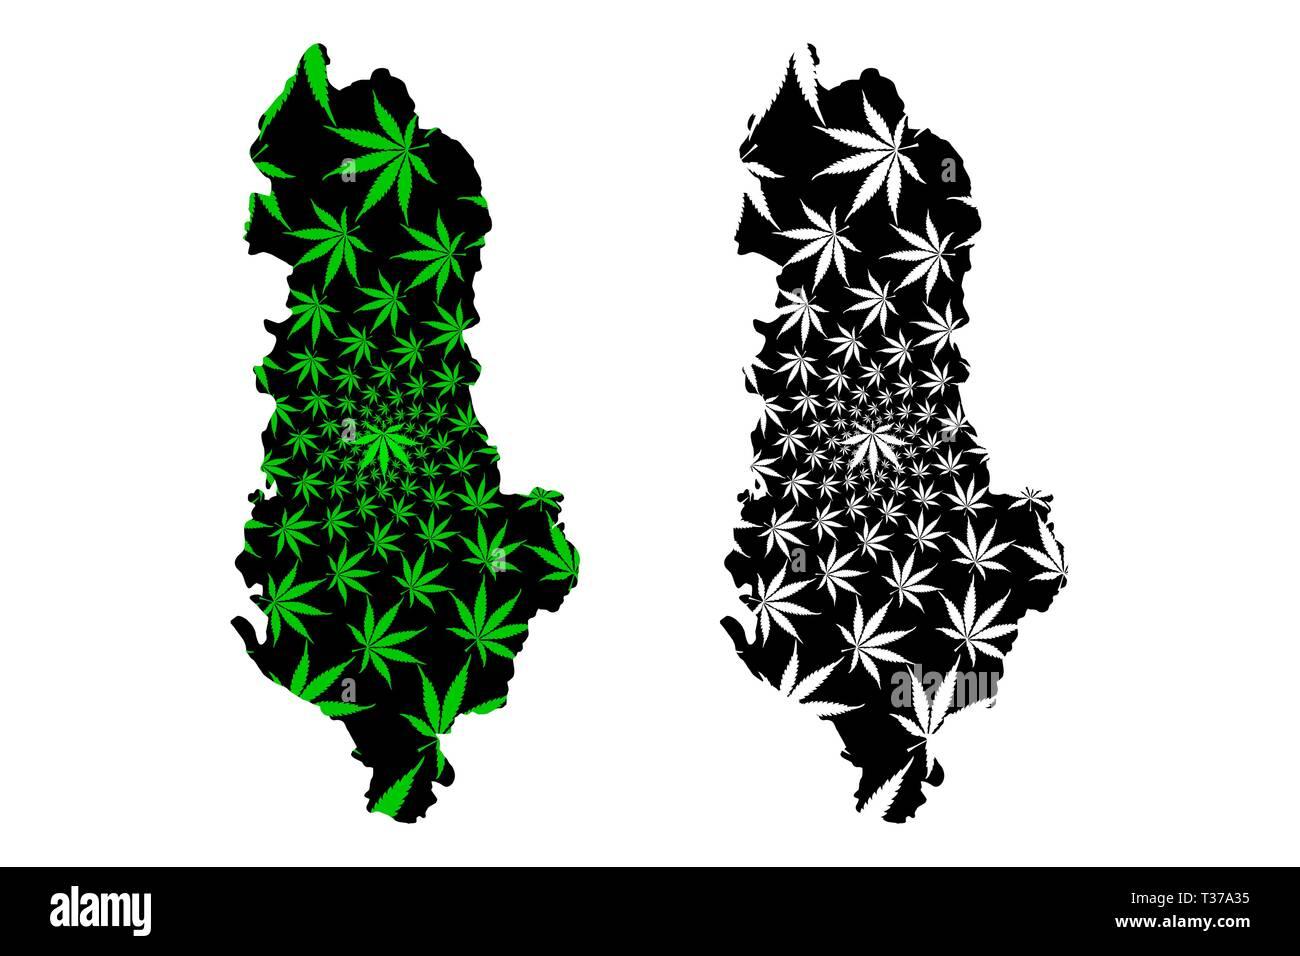 Albania - map is designed cannabis leaf green and black, Republic of Albania map made of marijuana (marihuana,THC) foliage, - Stock Vector